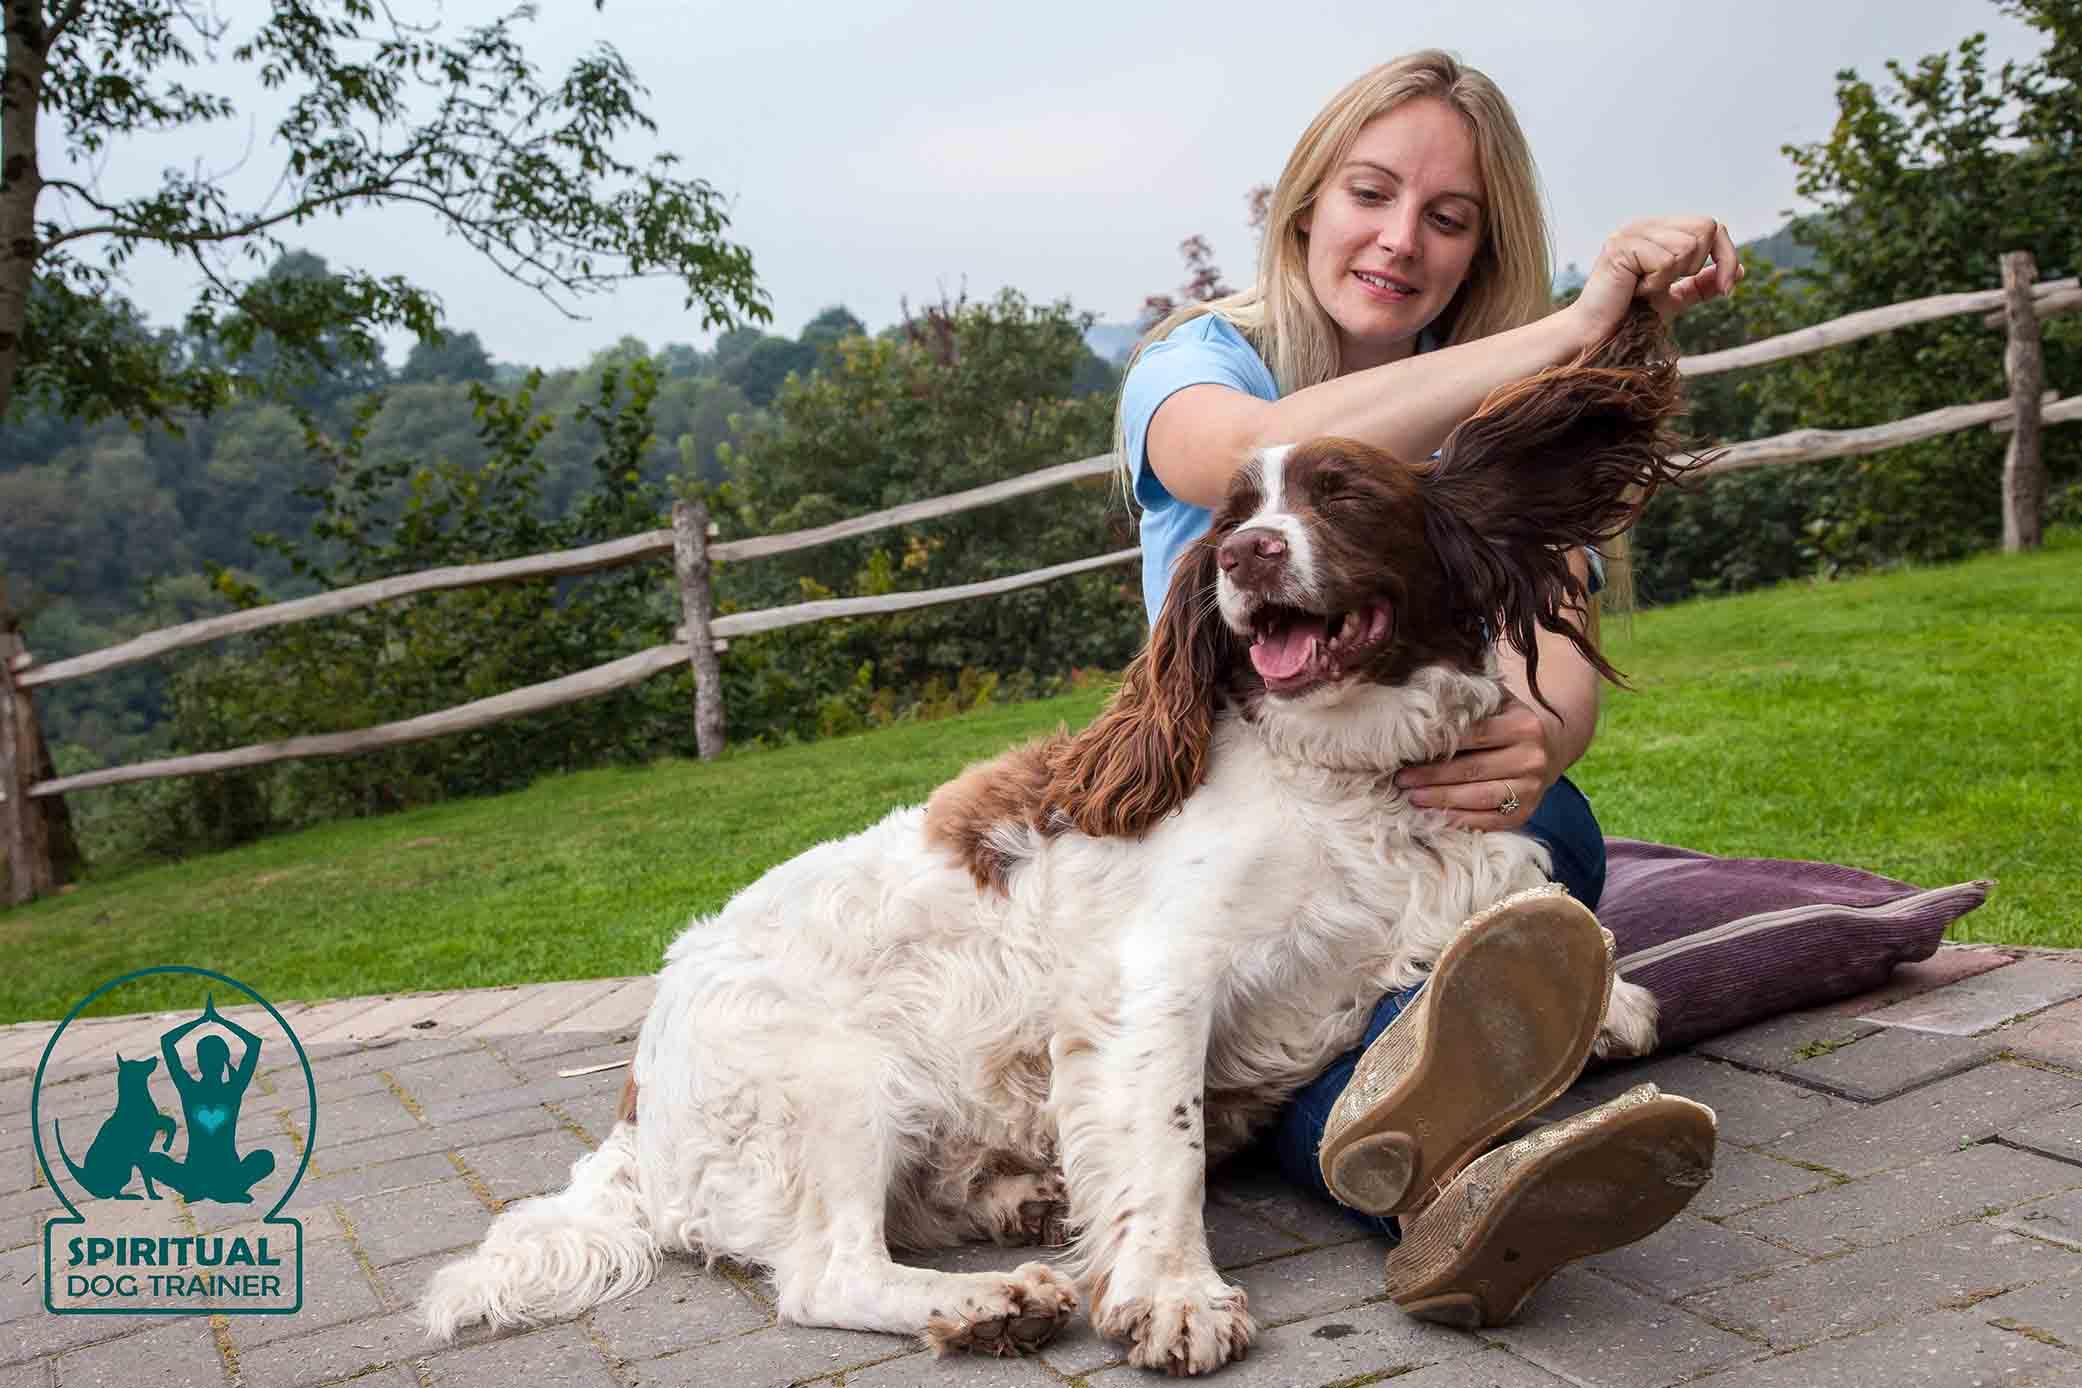 spiritual-dog-trainer-canine-flow-dog-retreat